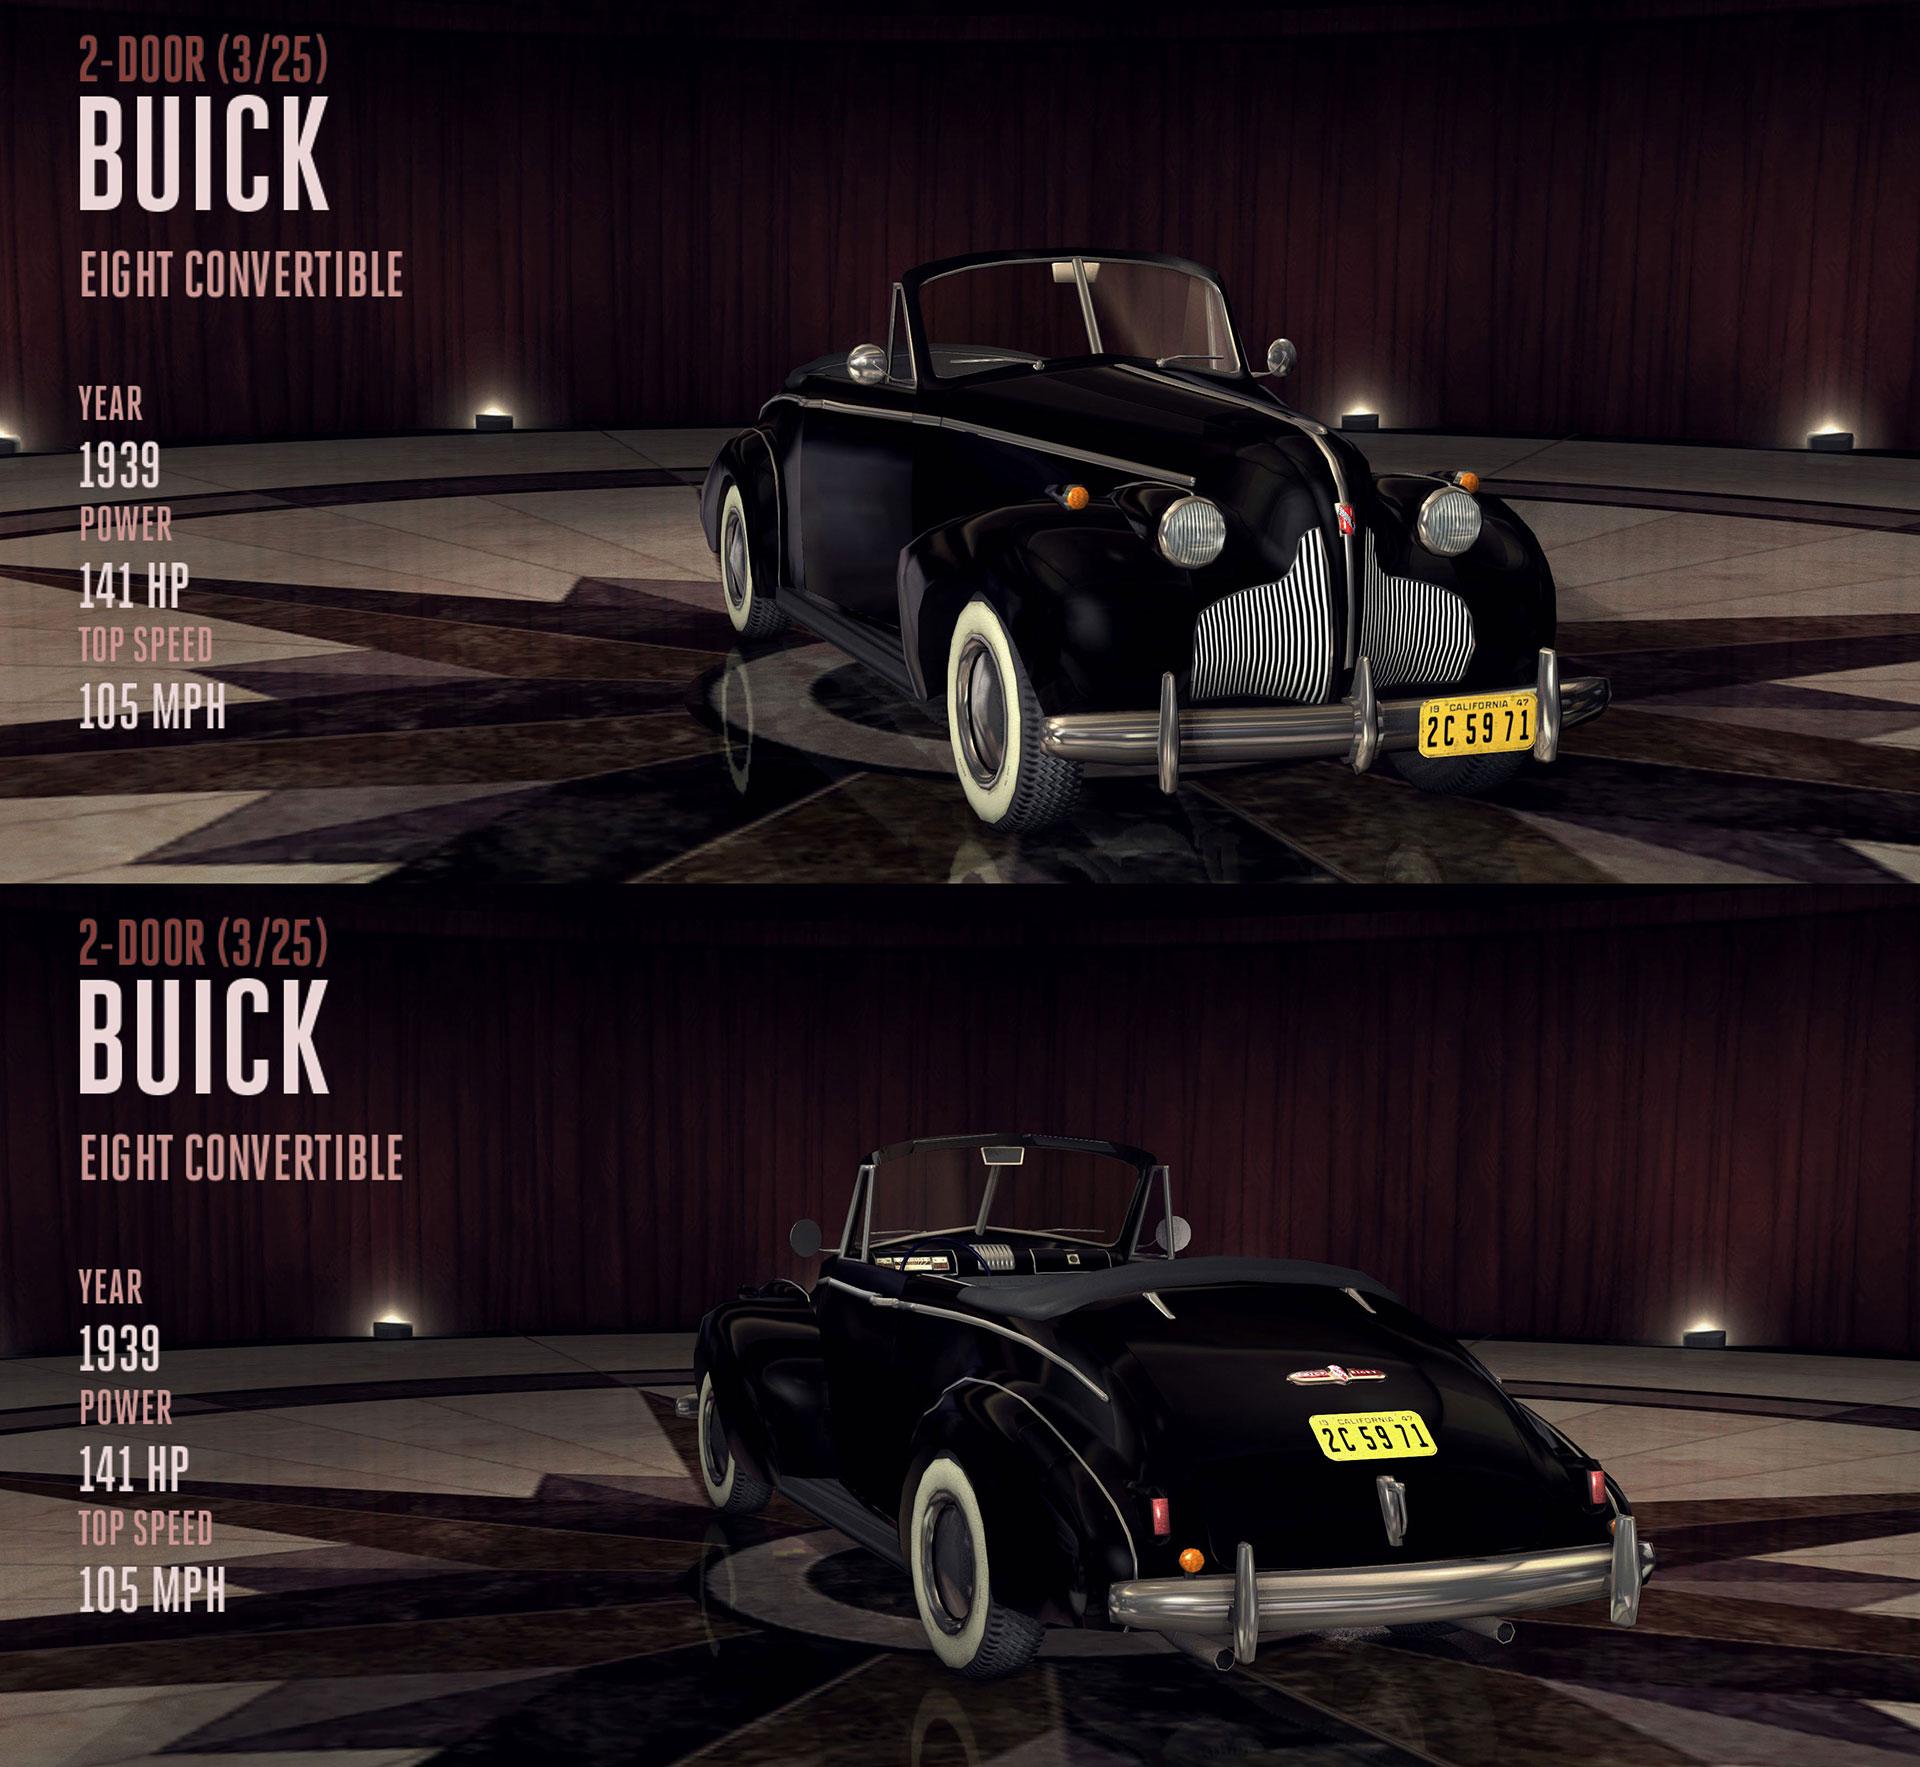 Archivo:1939-buick-eight-convertible.jpg